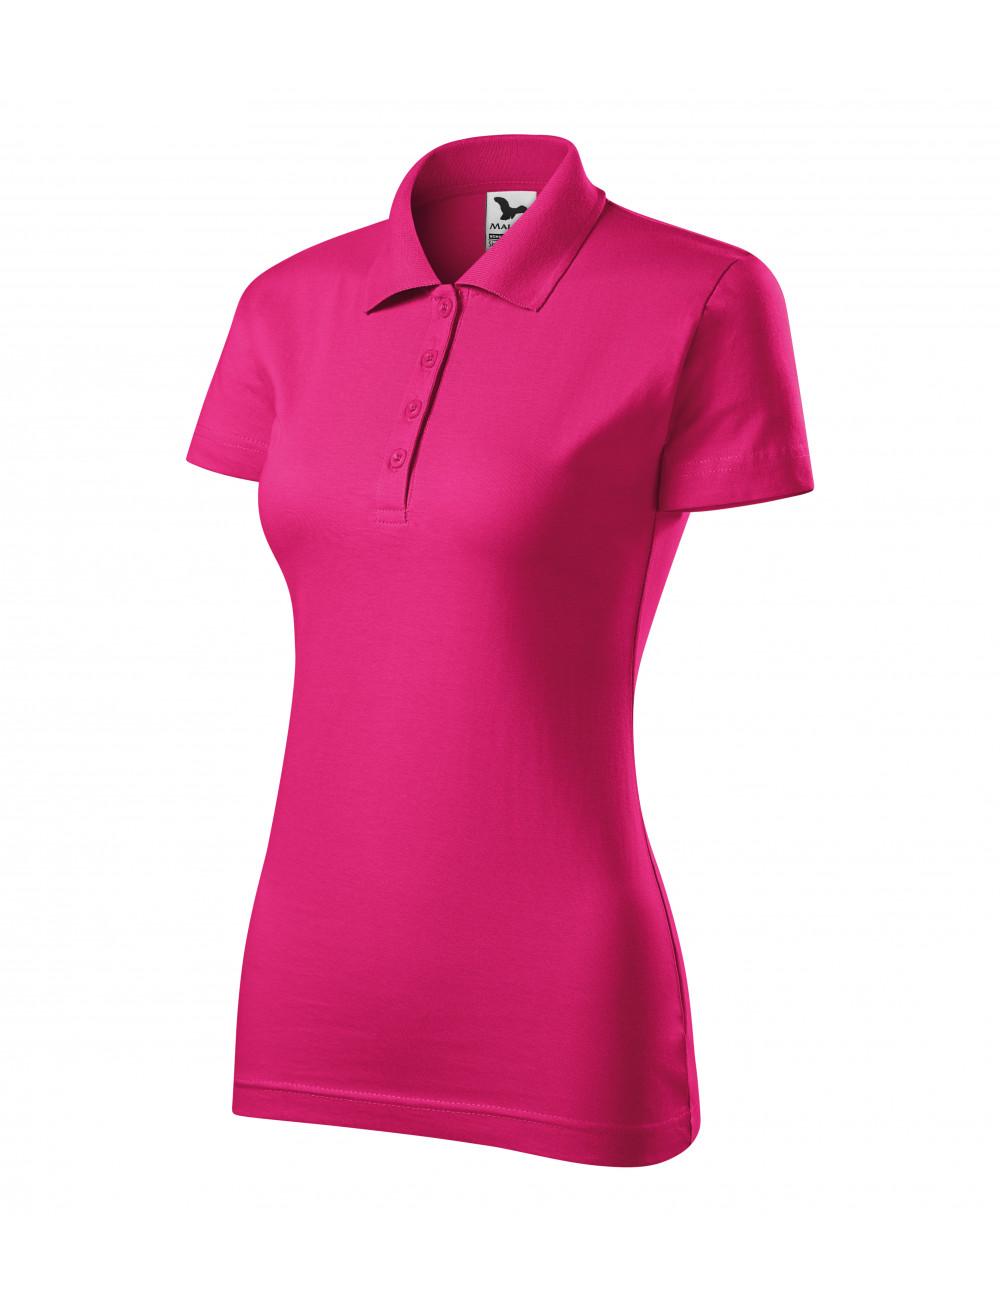 Adler MALFINI Koszulka polo damska Single J. 223 czerwień purpurowa